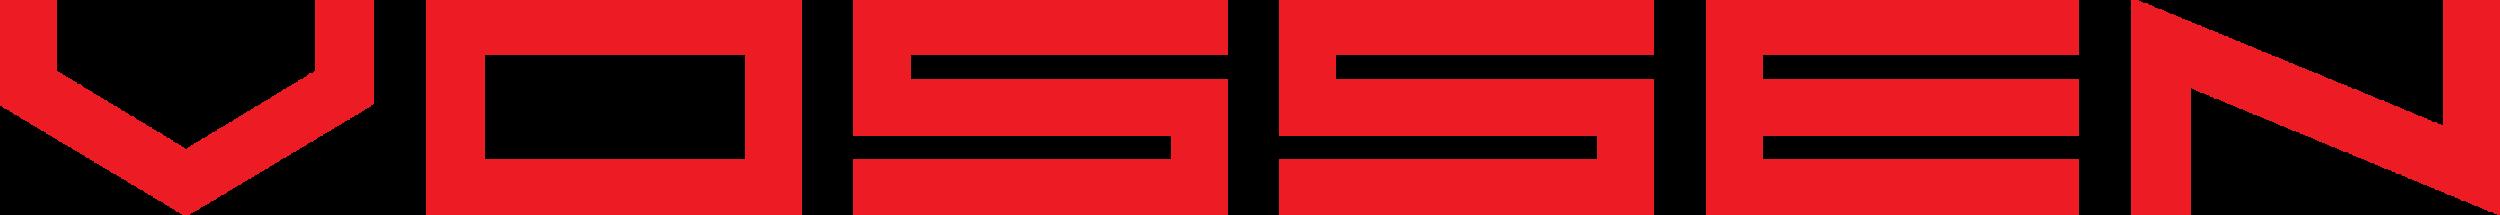 Vossen_Logo_Type.png